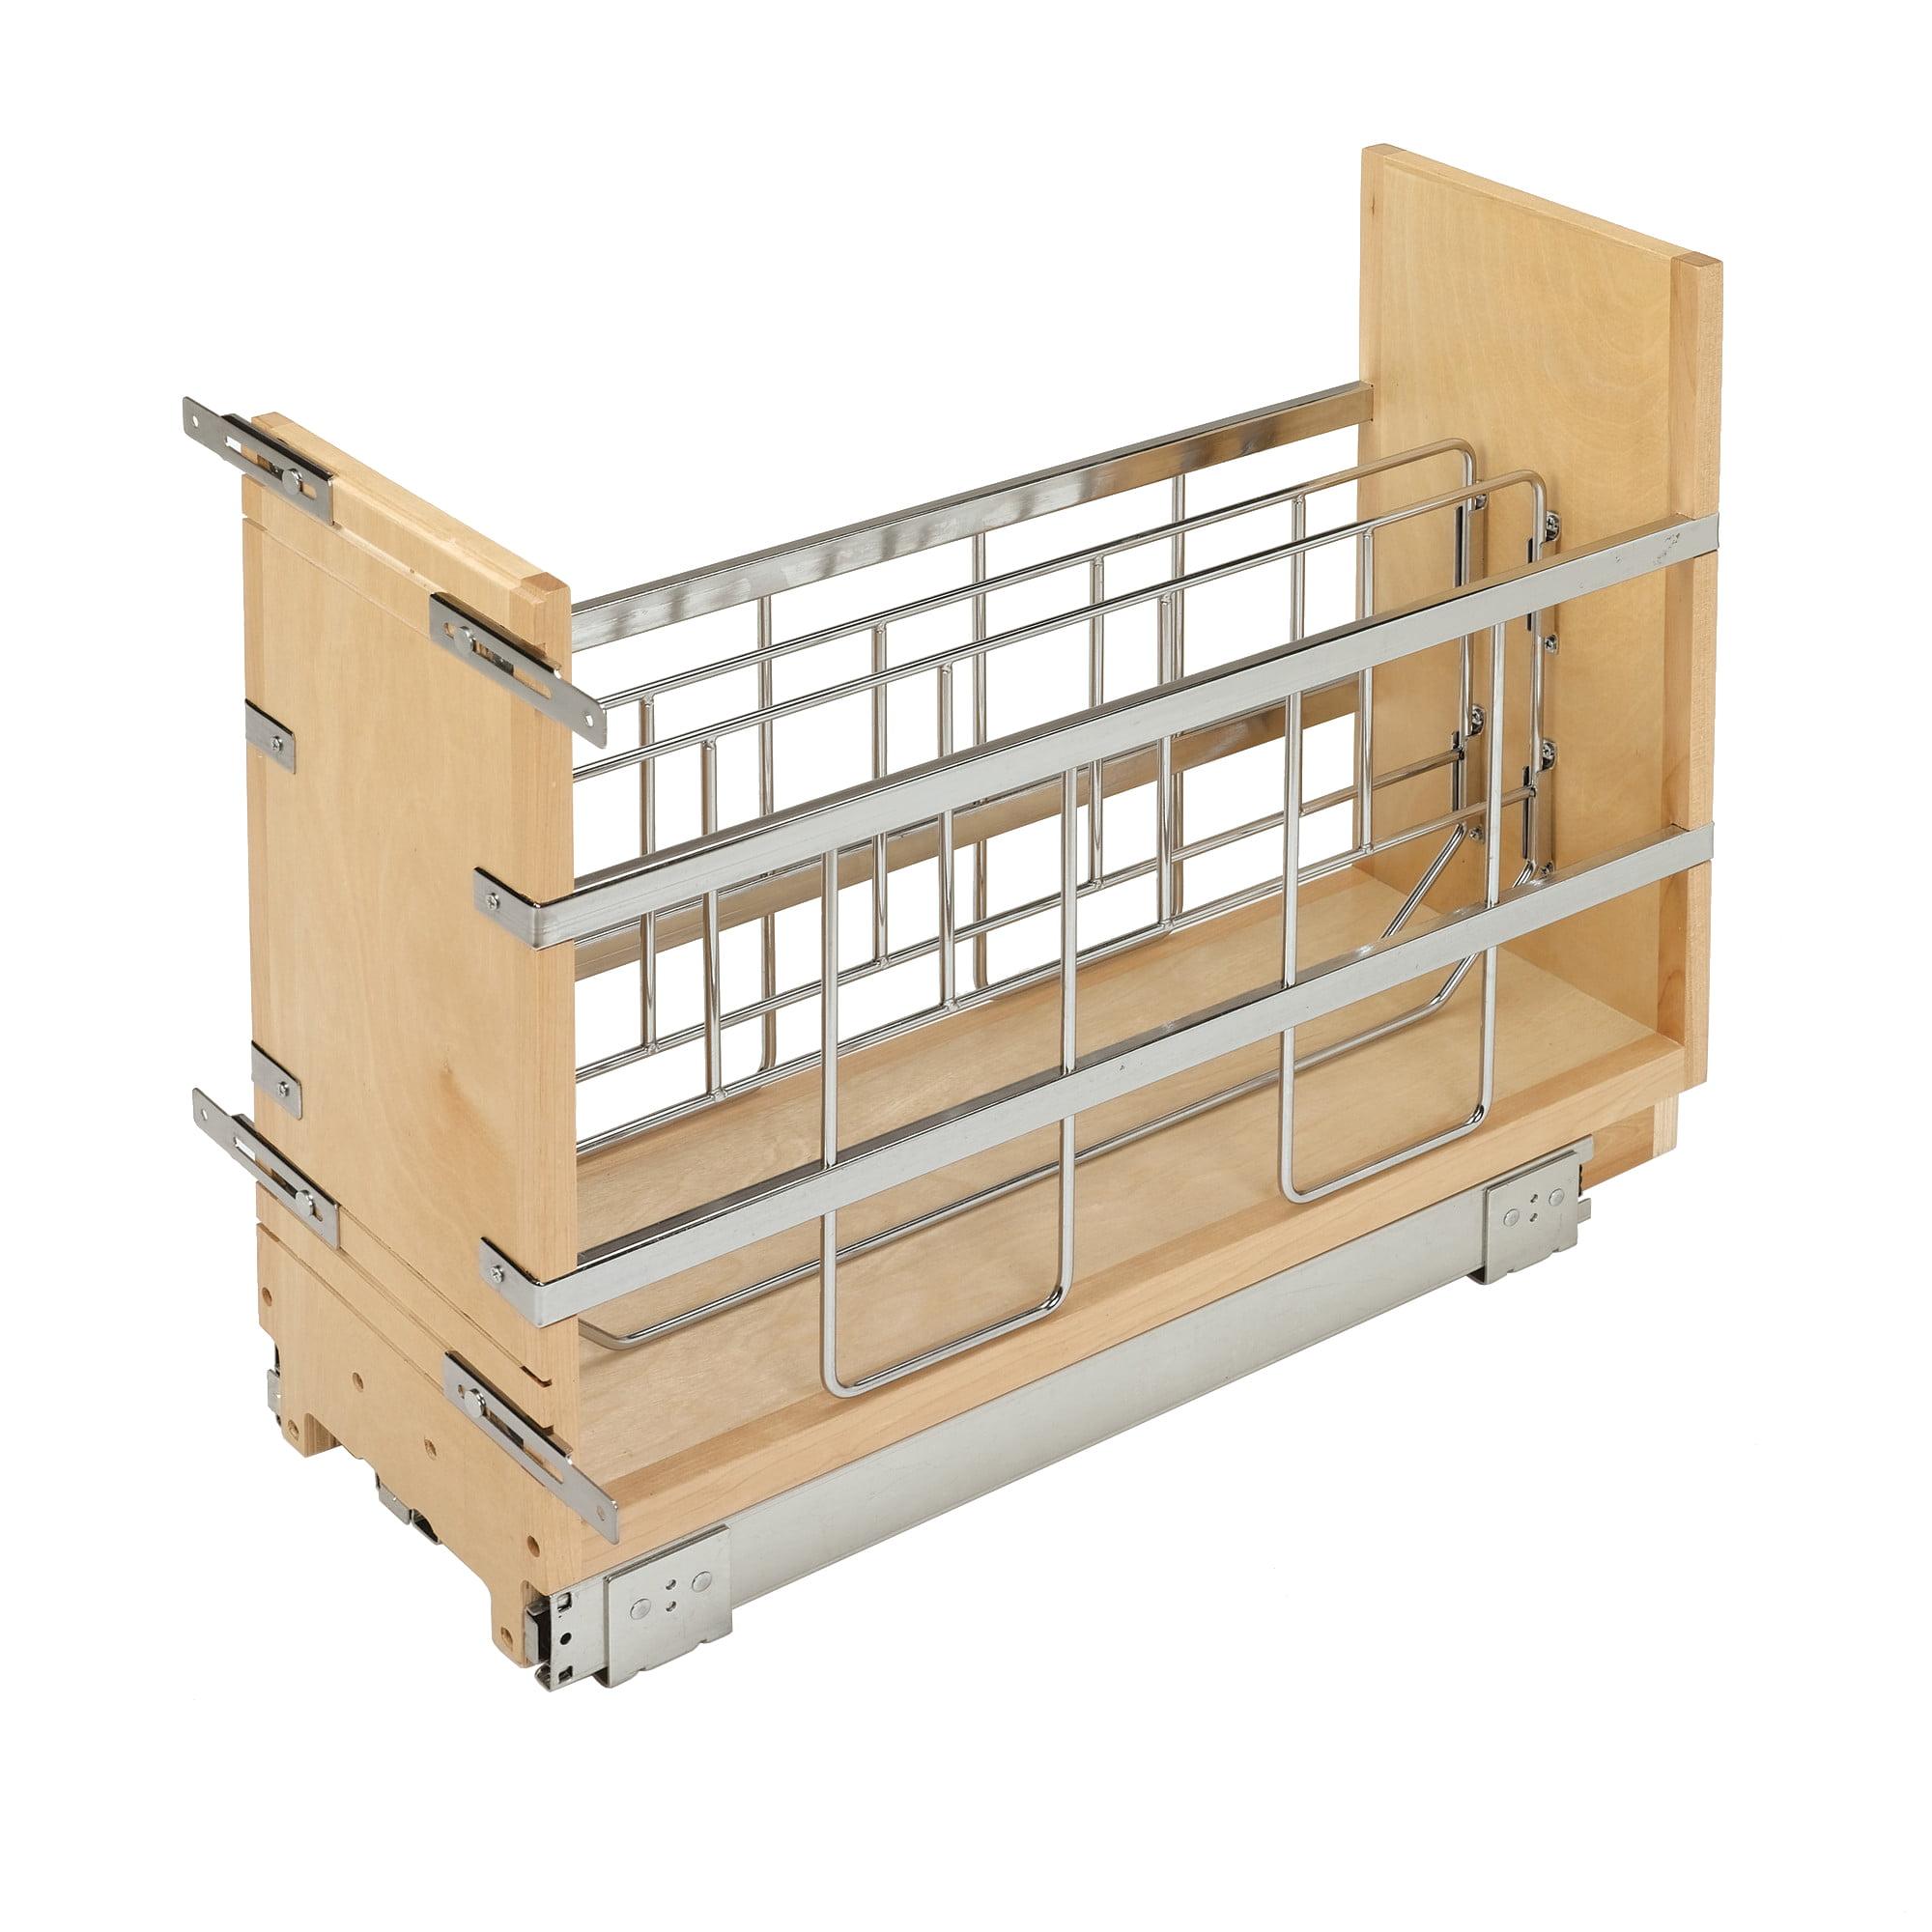 Rev A Shelf 447 Bcbbsc 5c 5 Inch Pull Out Tray Divider Kitchen Cabinet Organizer Walmart Canada